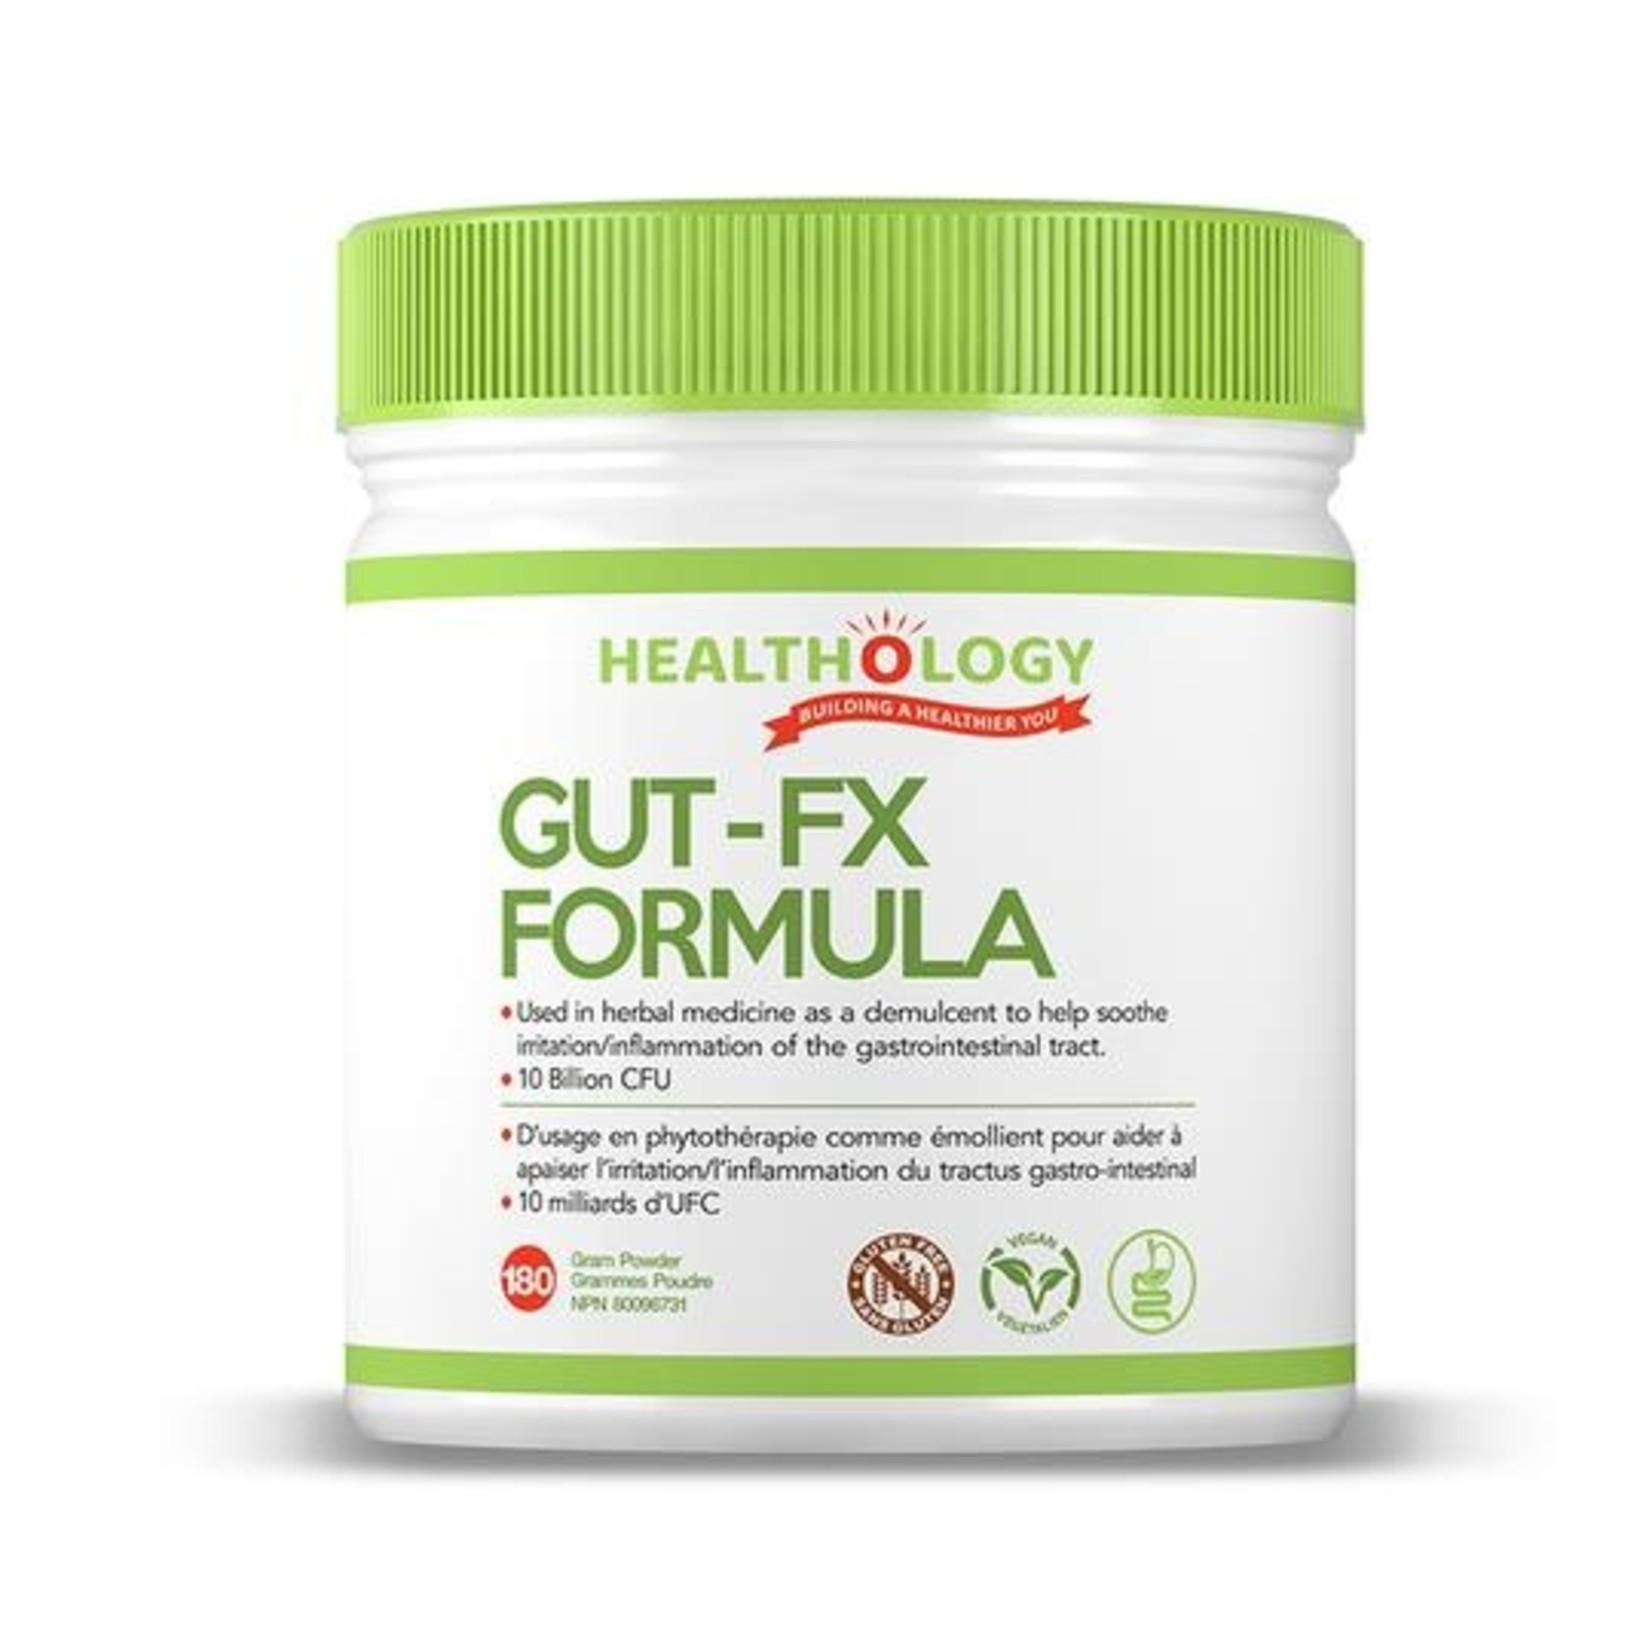 Healthology Healthology Gut-FX Formula 180g